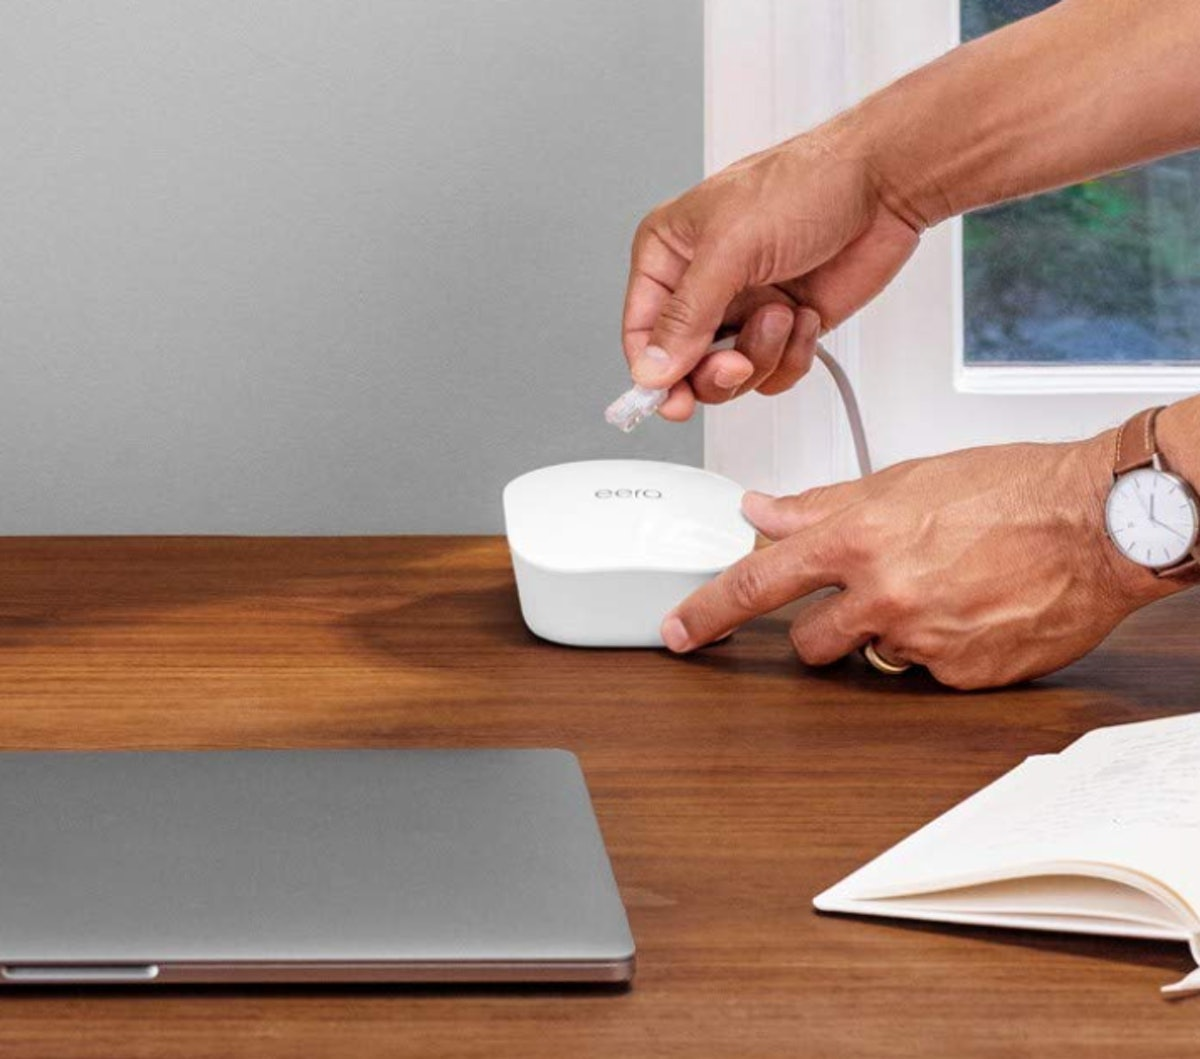 Eero Mesh Wi-Fi System (3-Pack)